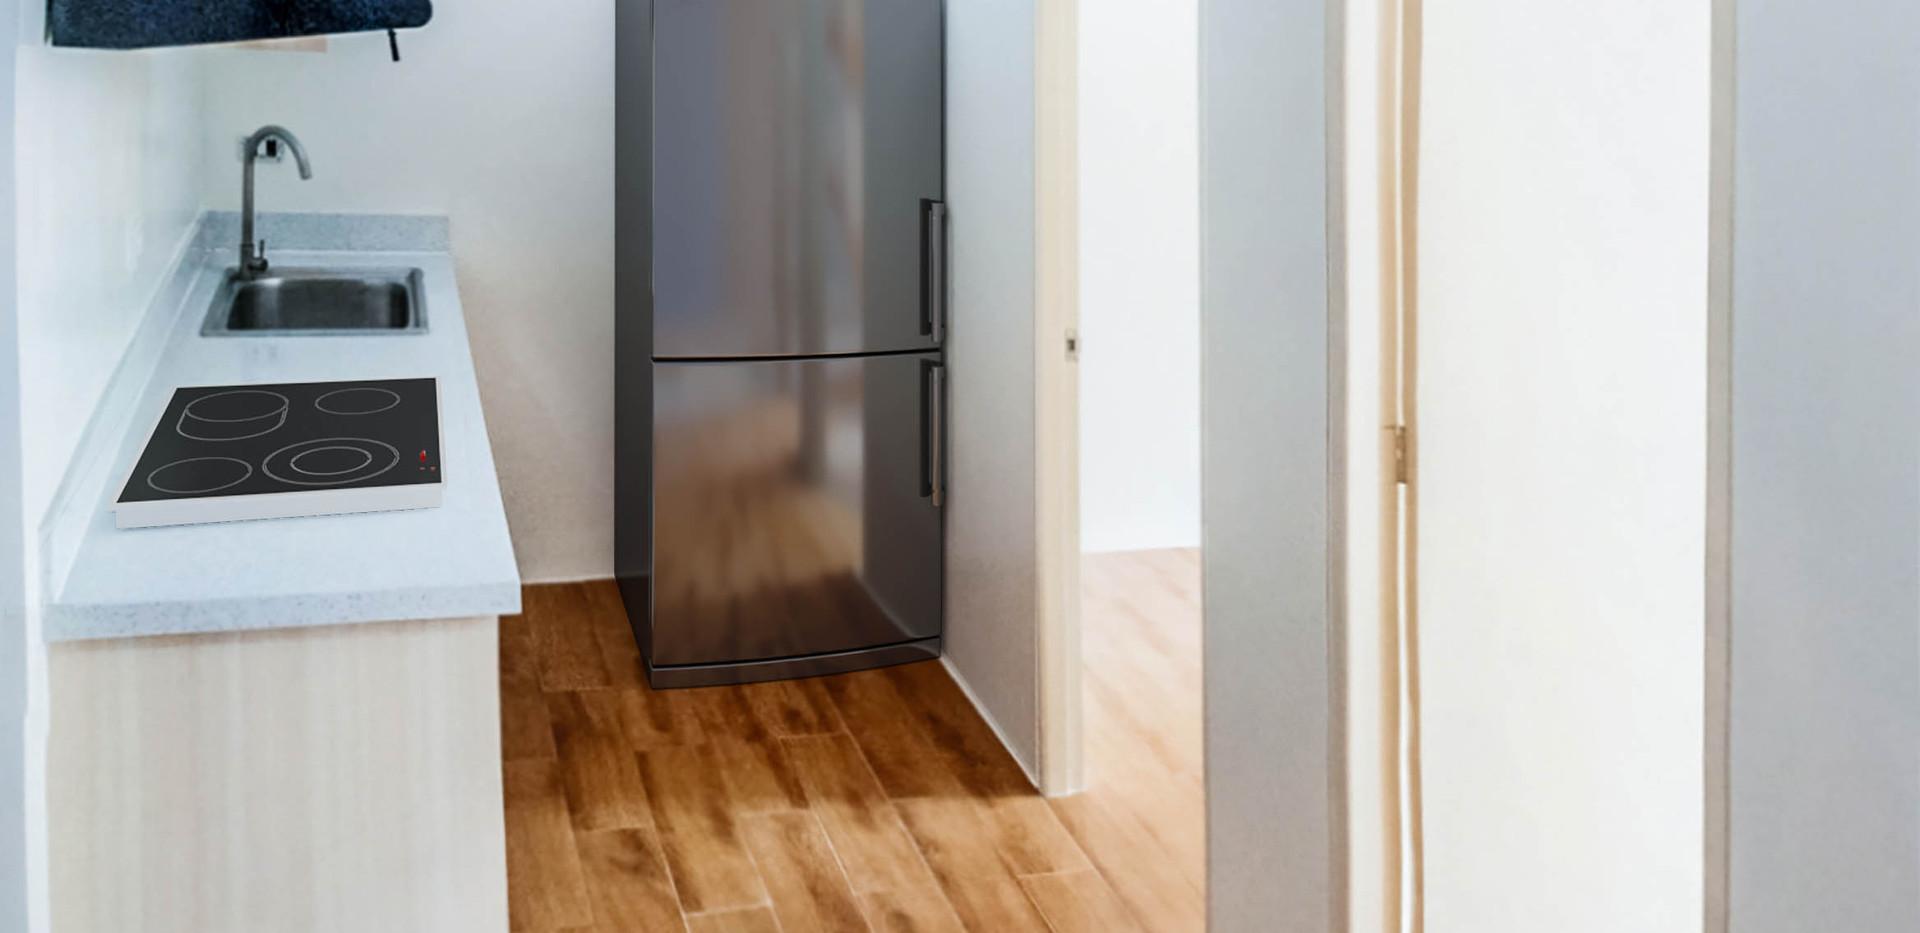 2-Bedroom Unit Kitchen Area Second View